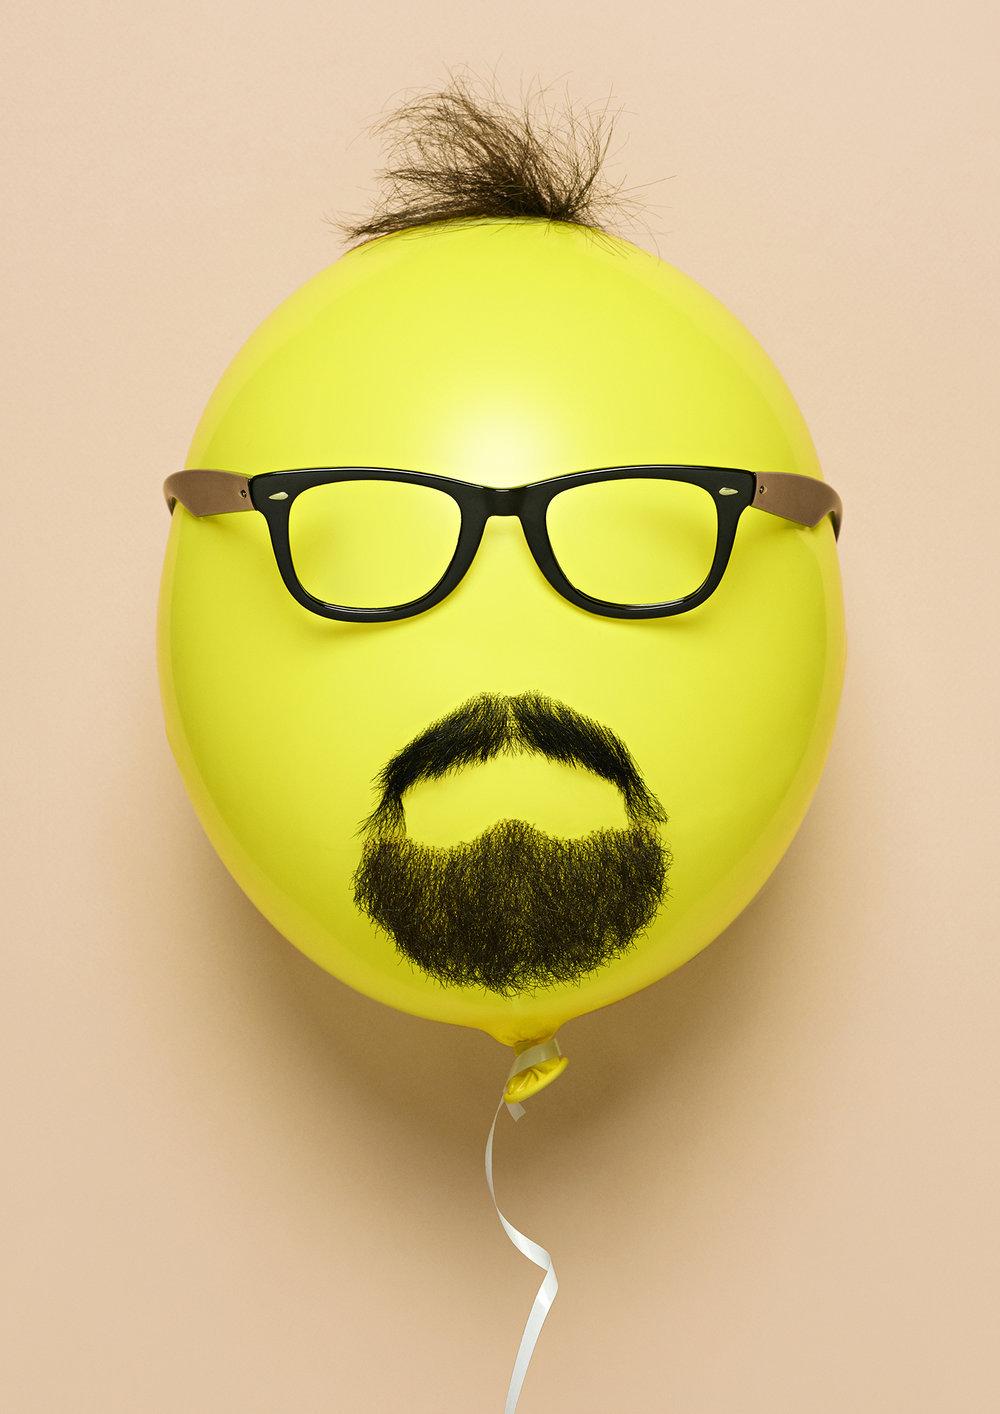 Ballons_seuls5.jpg